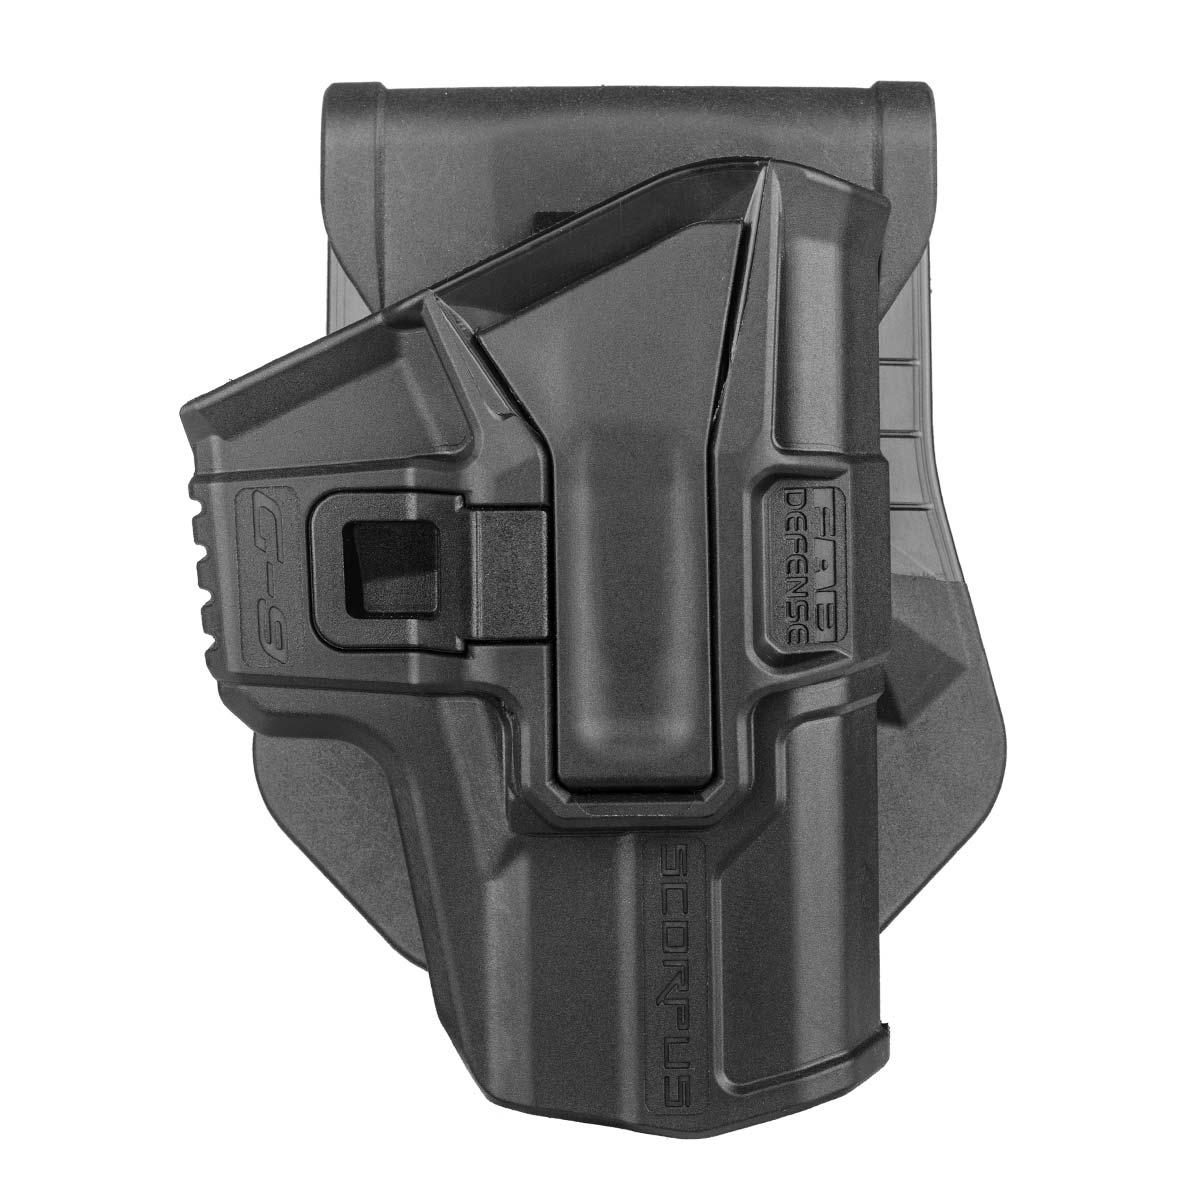 IMI new Sig Sauer mk 25 Level-3 Retention Gun Holster DESERT TAN